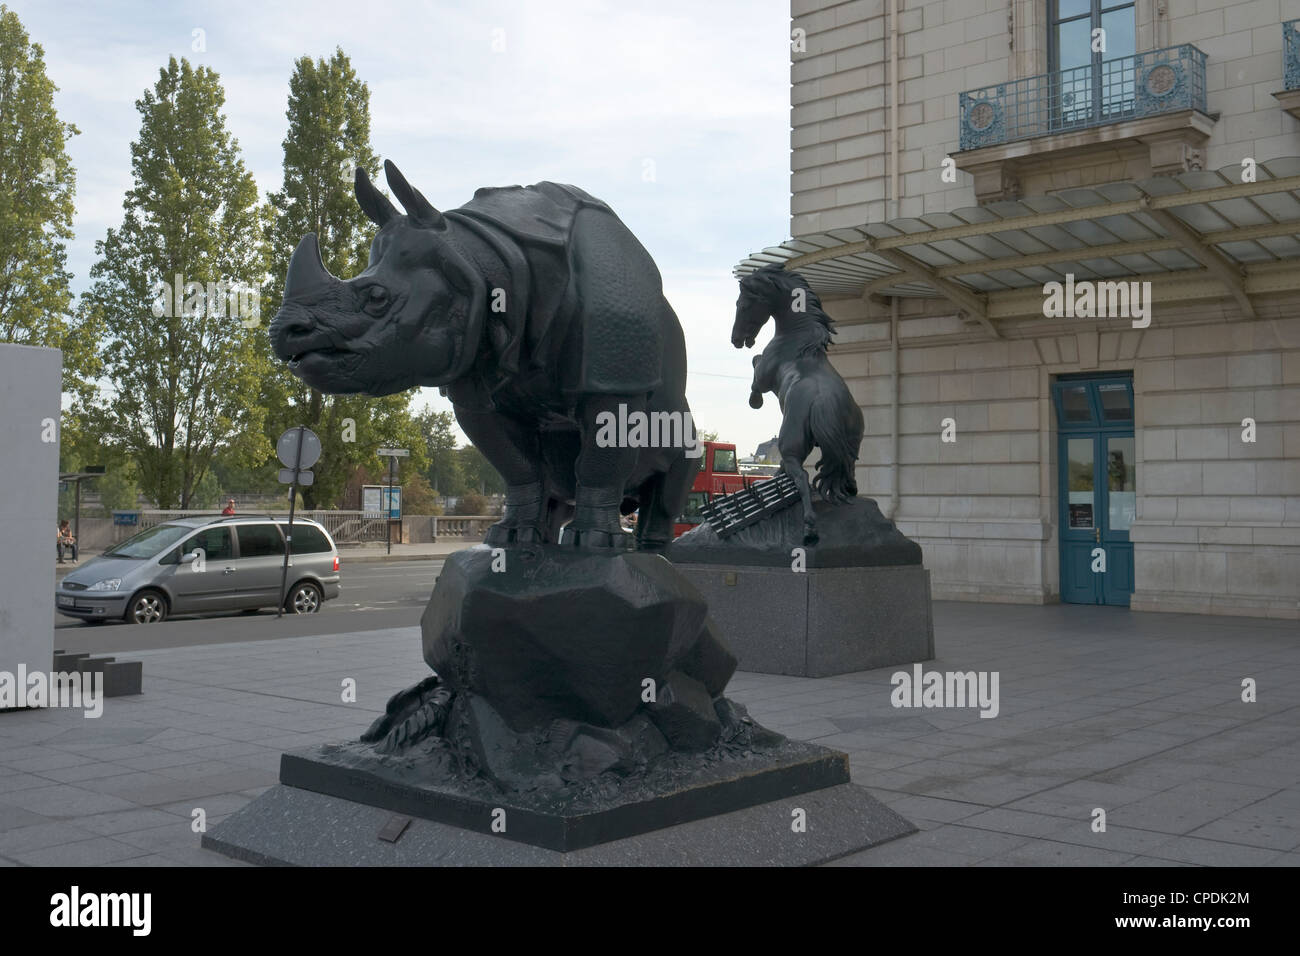 Bronze sculptures in front of the Quai d'Orsay museum in Paris [...] Stock Photo